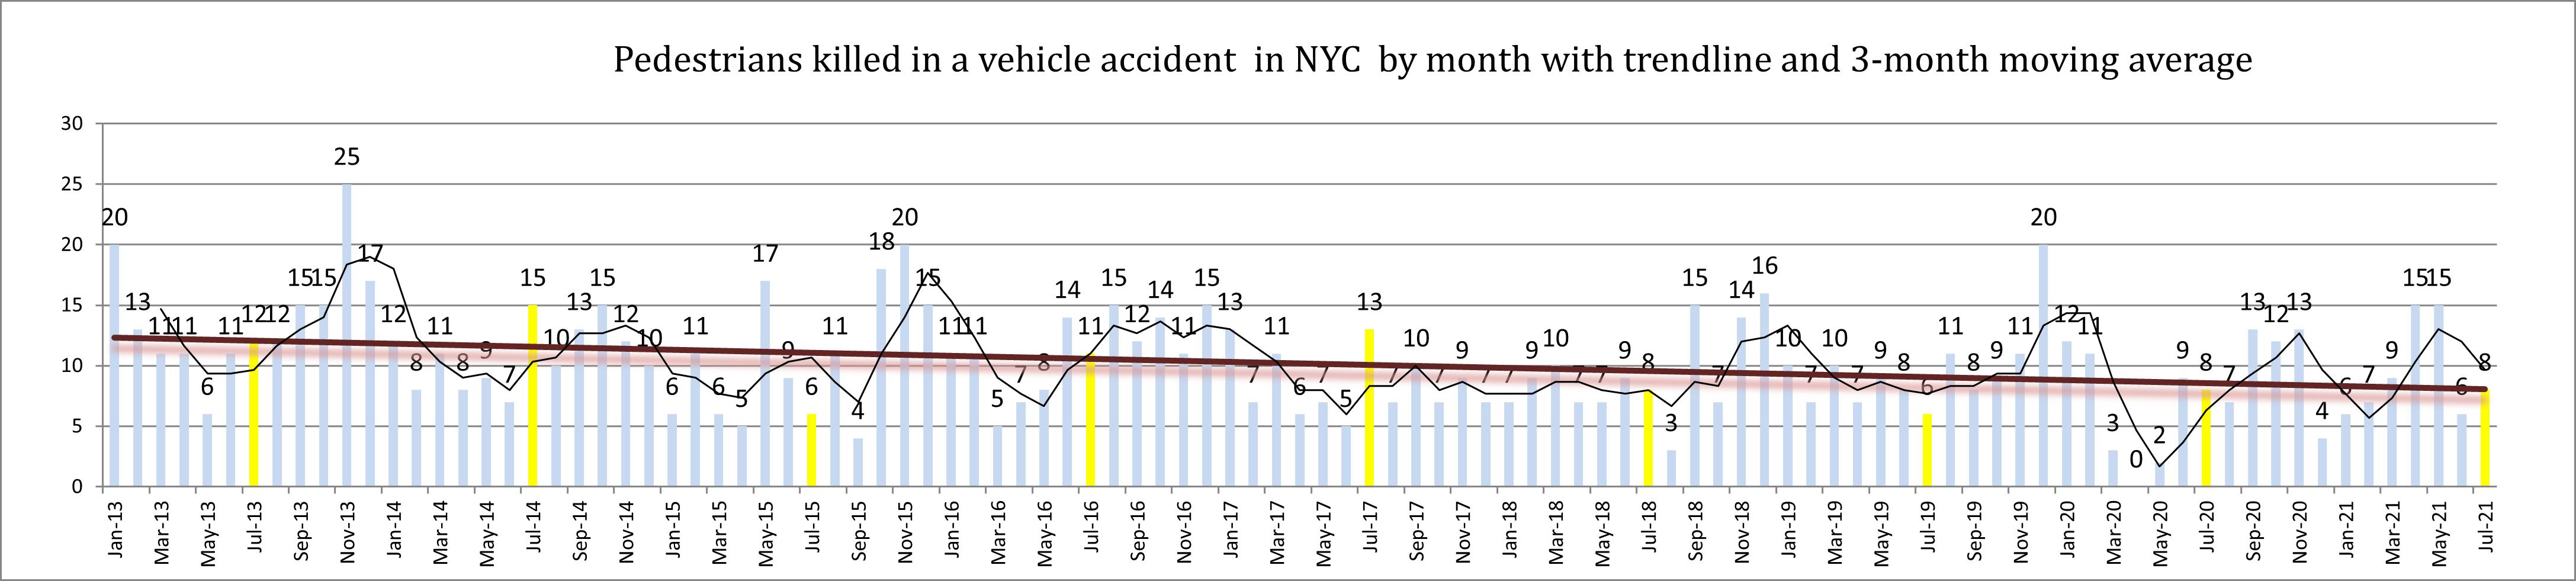 pedestrian fatalities in New York City in July 2021